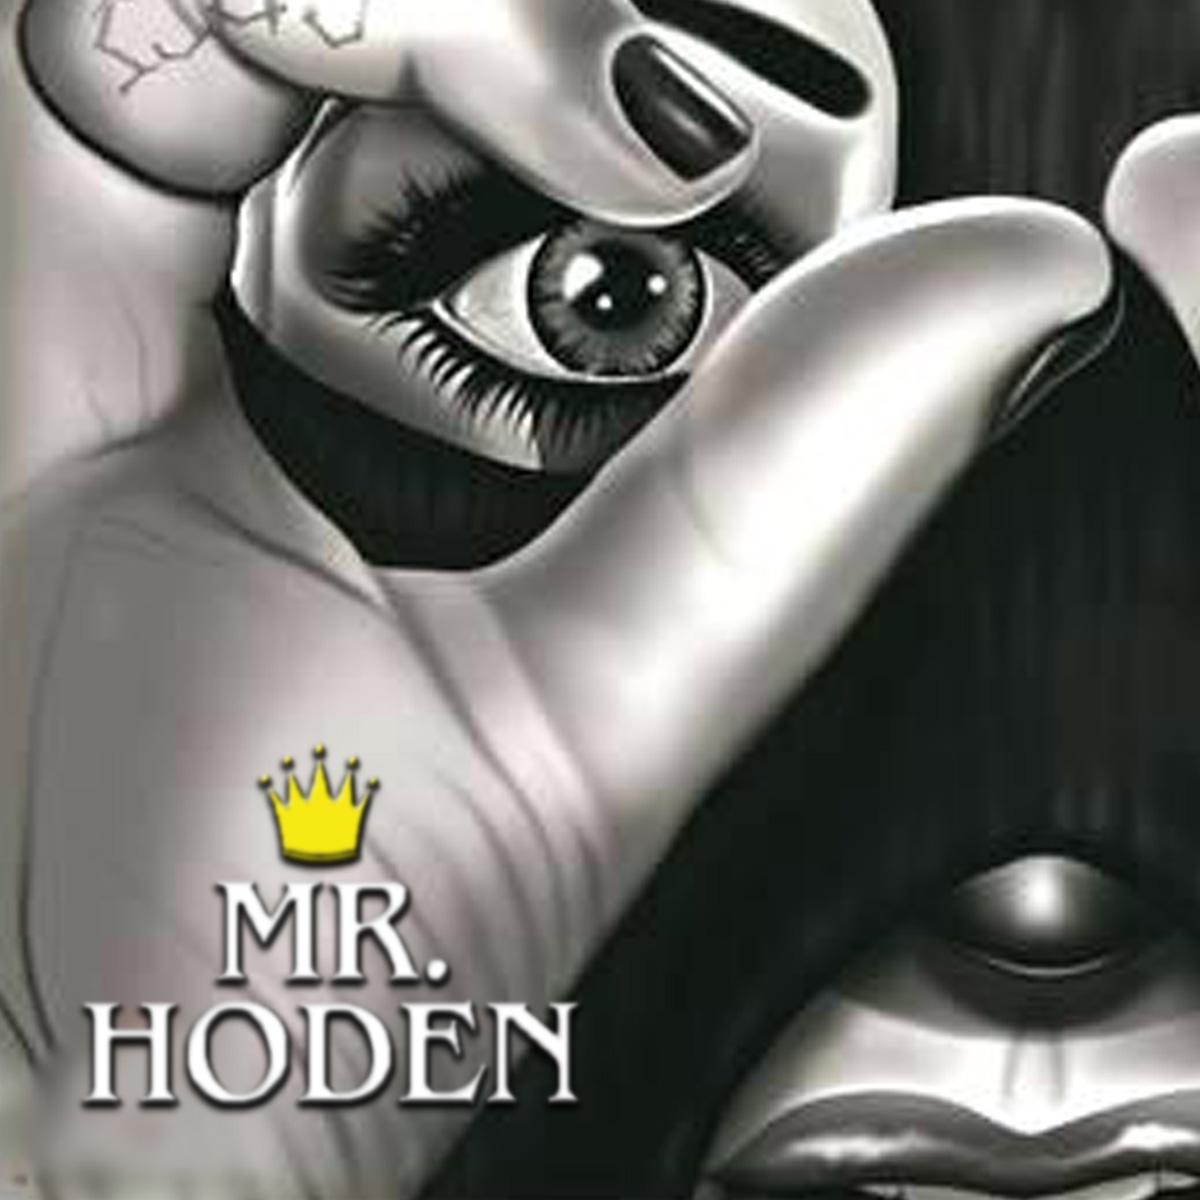 Upcoming: Mr. Hoden - Hard Dark Trap Beat 2019 [FREE BEAT]